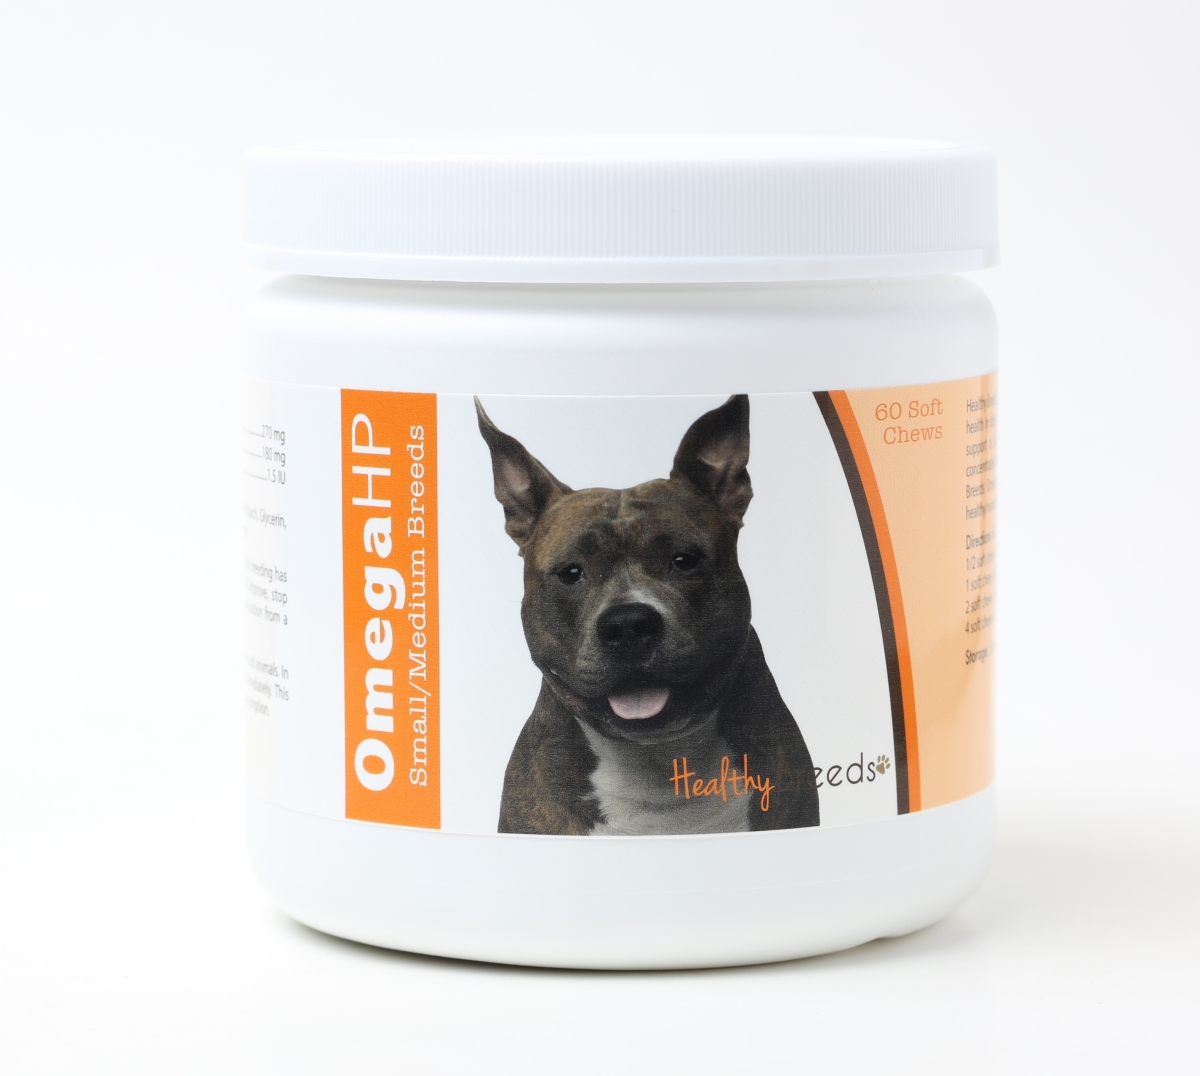 Healthy Breeds 840235100898 Omega-3 Fatty Acids Skin & Coat Soft Chews